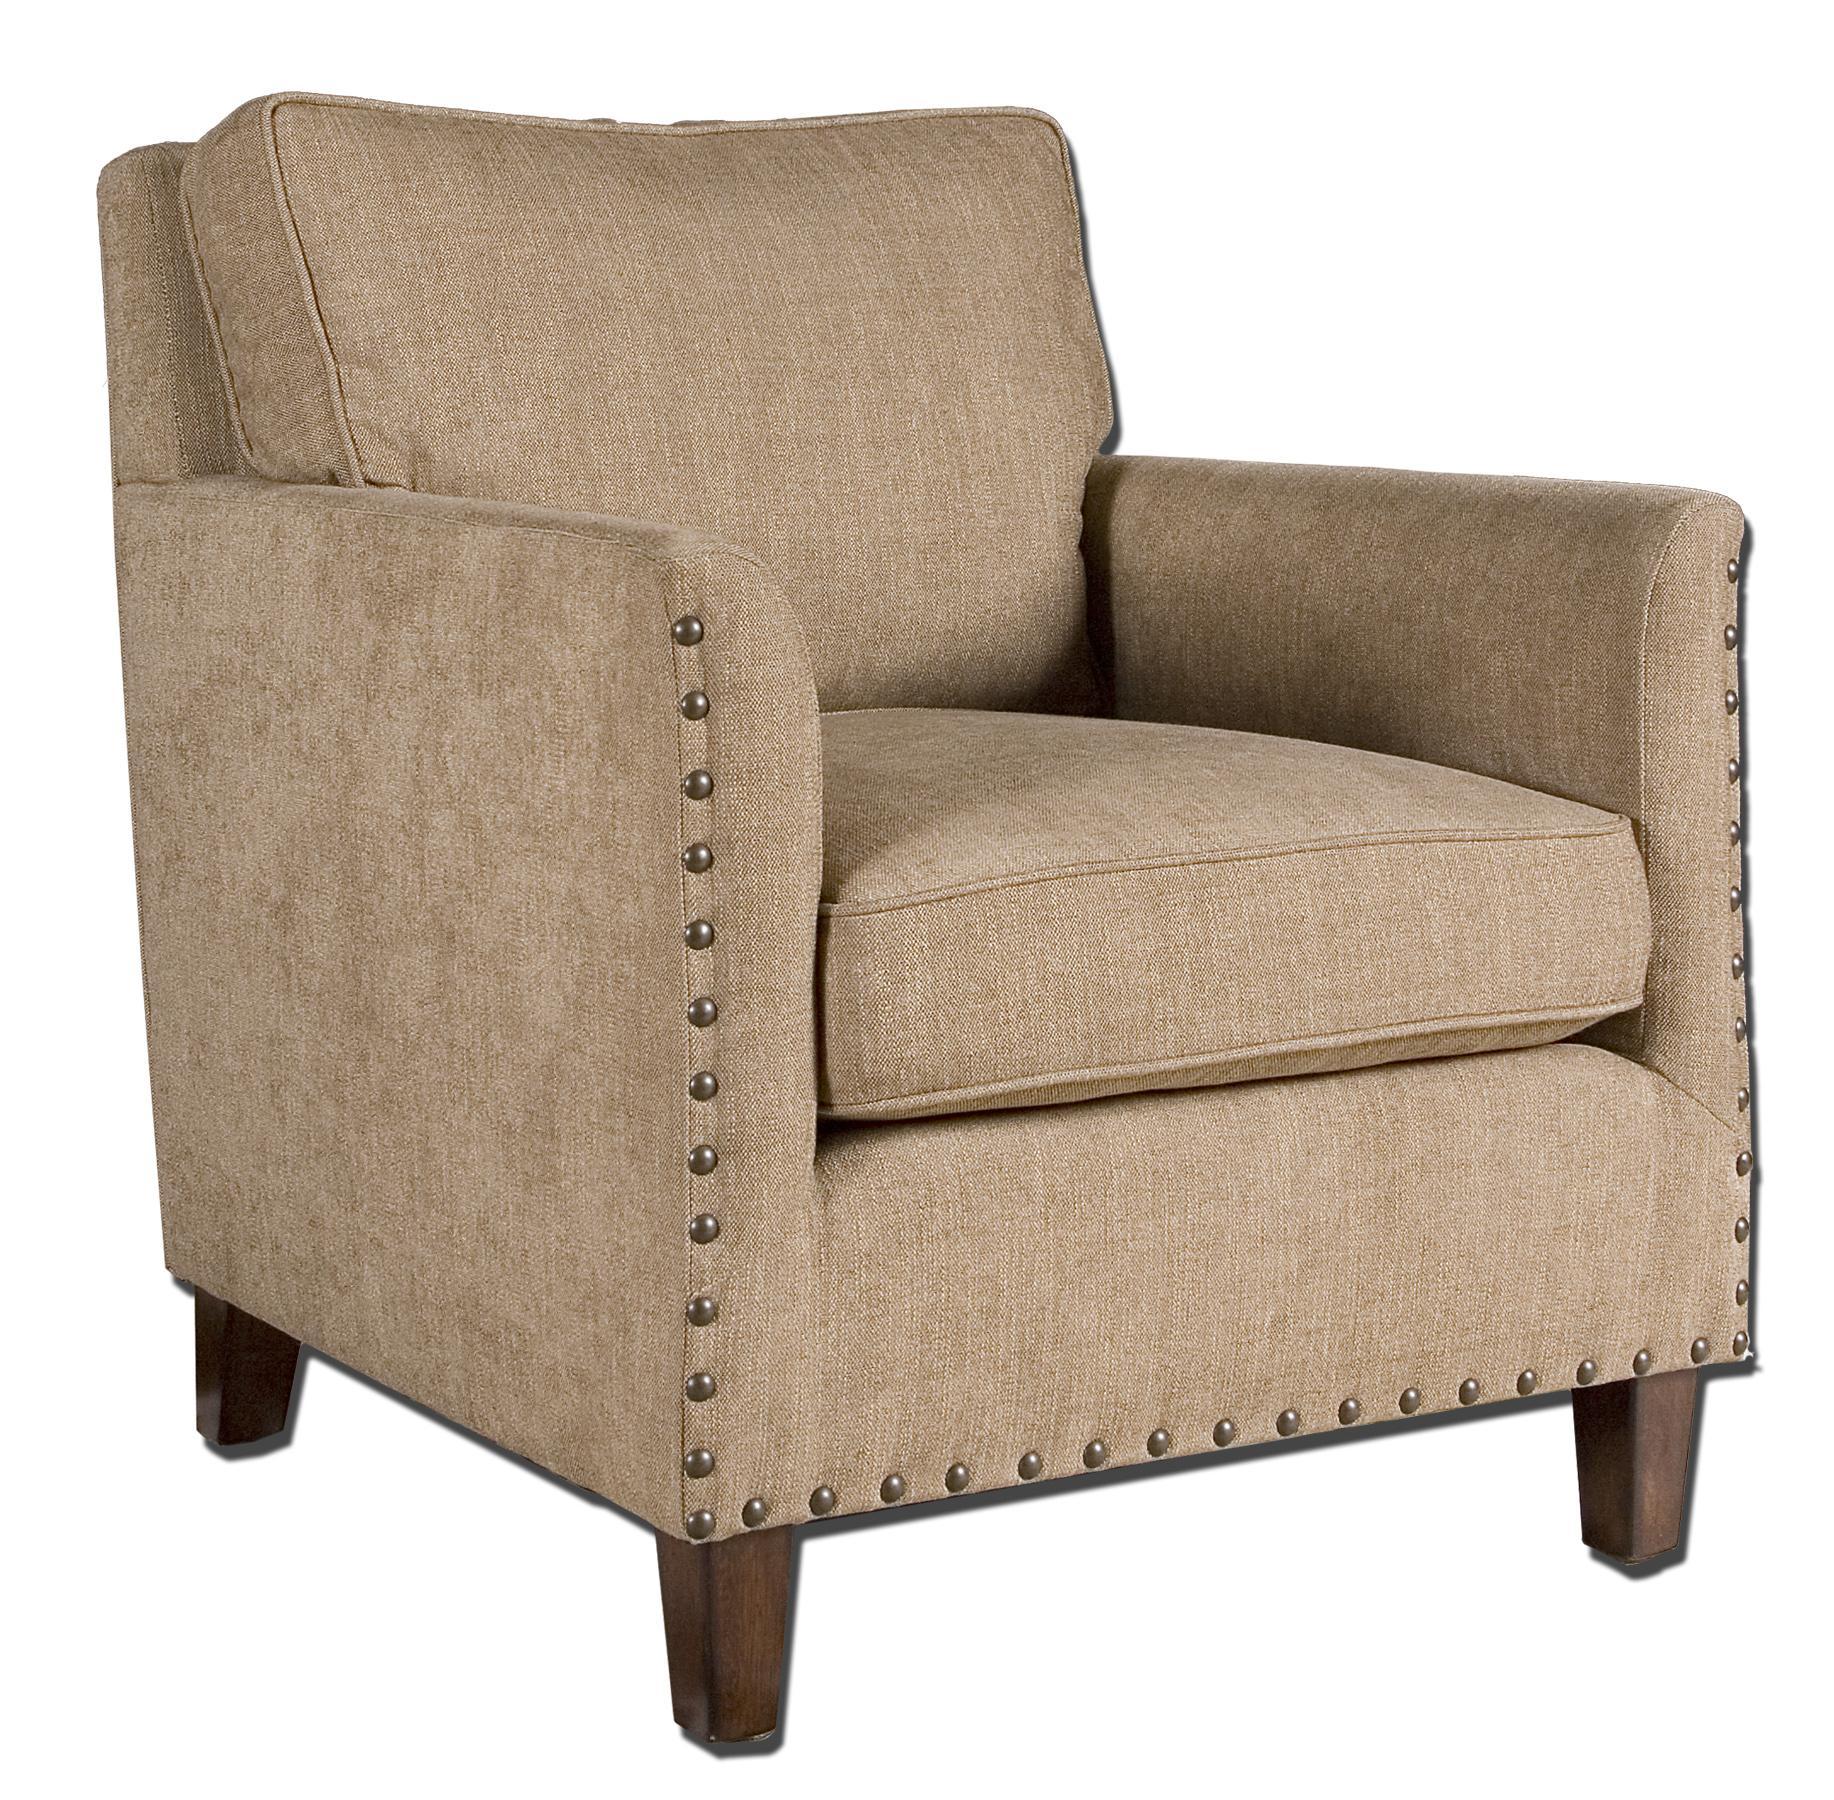 Uttermost Accent Furniture Keturah Armchair - Item Number: 23066